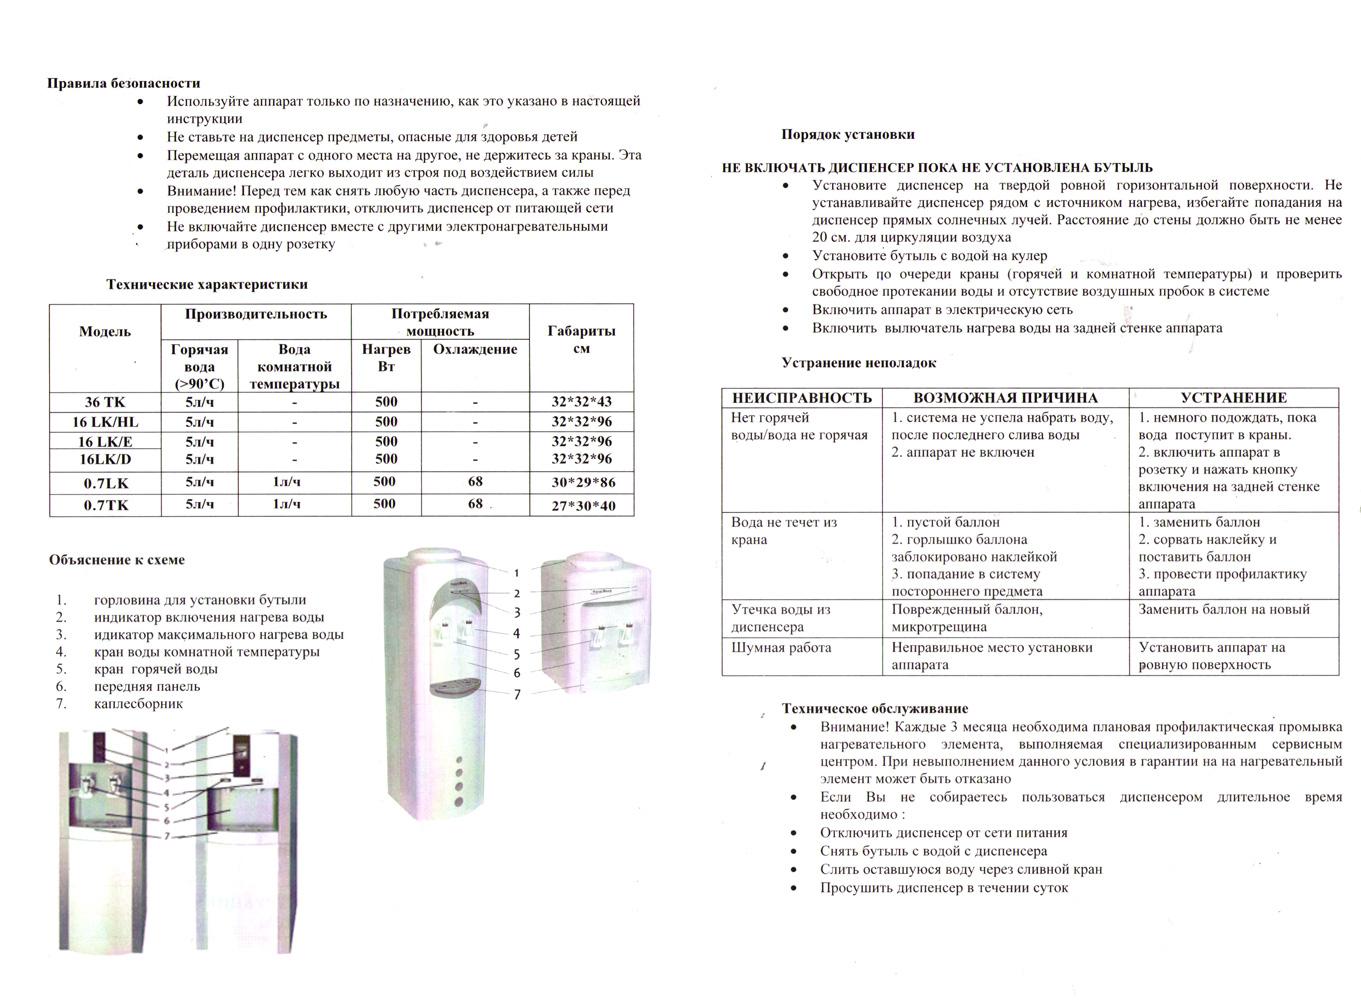 ����� Aqua Work 0.7-LK �������